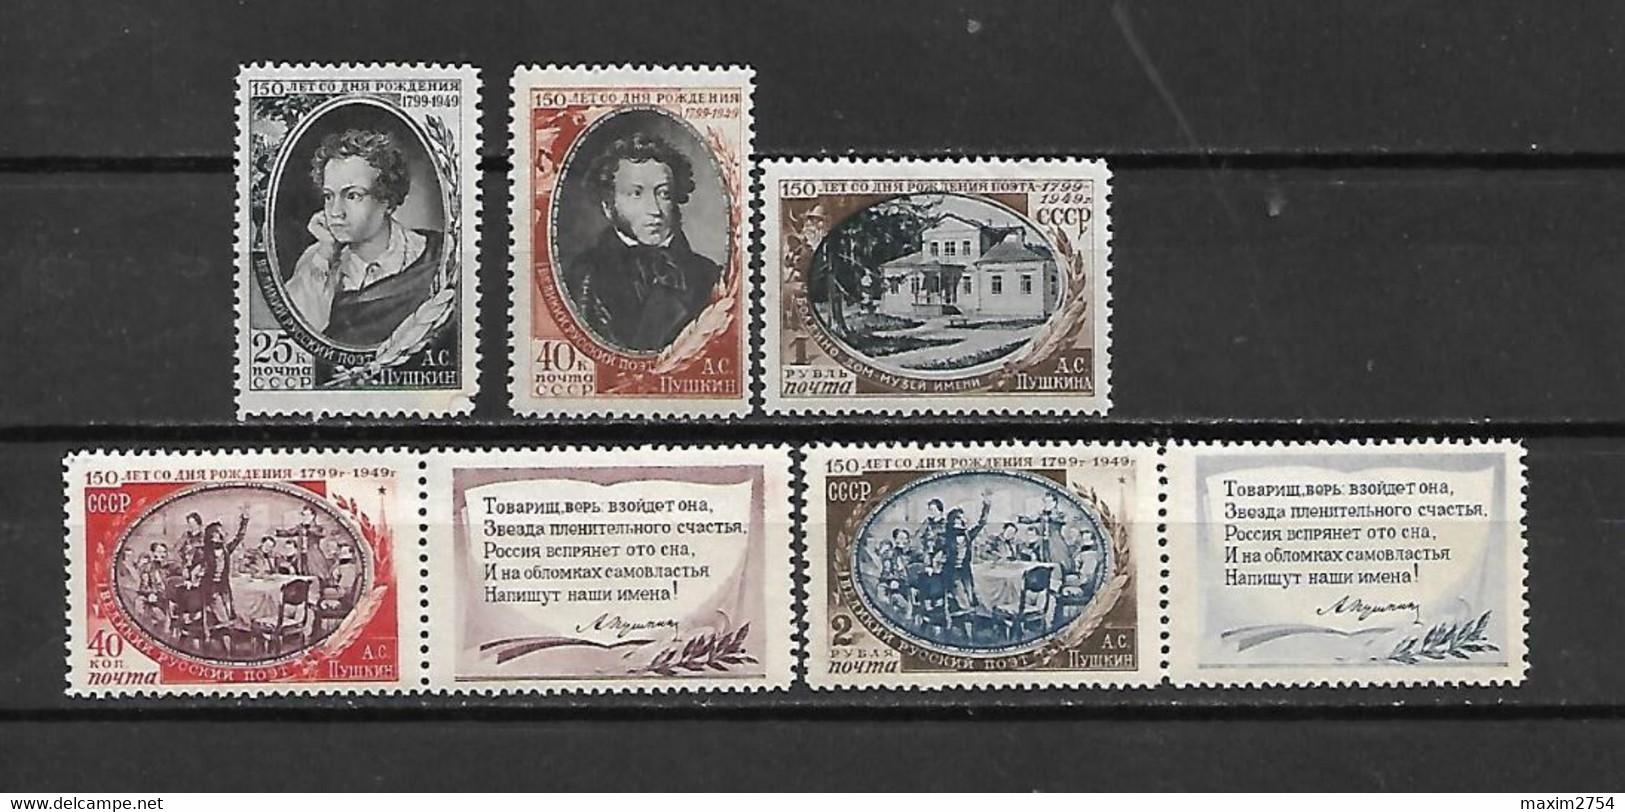 URSS - 1949 - N. 1341/45* (CATALOGO UNIFICATO) - Unused Stamps